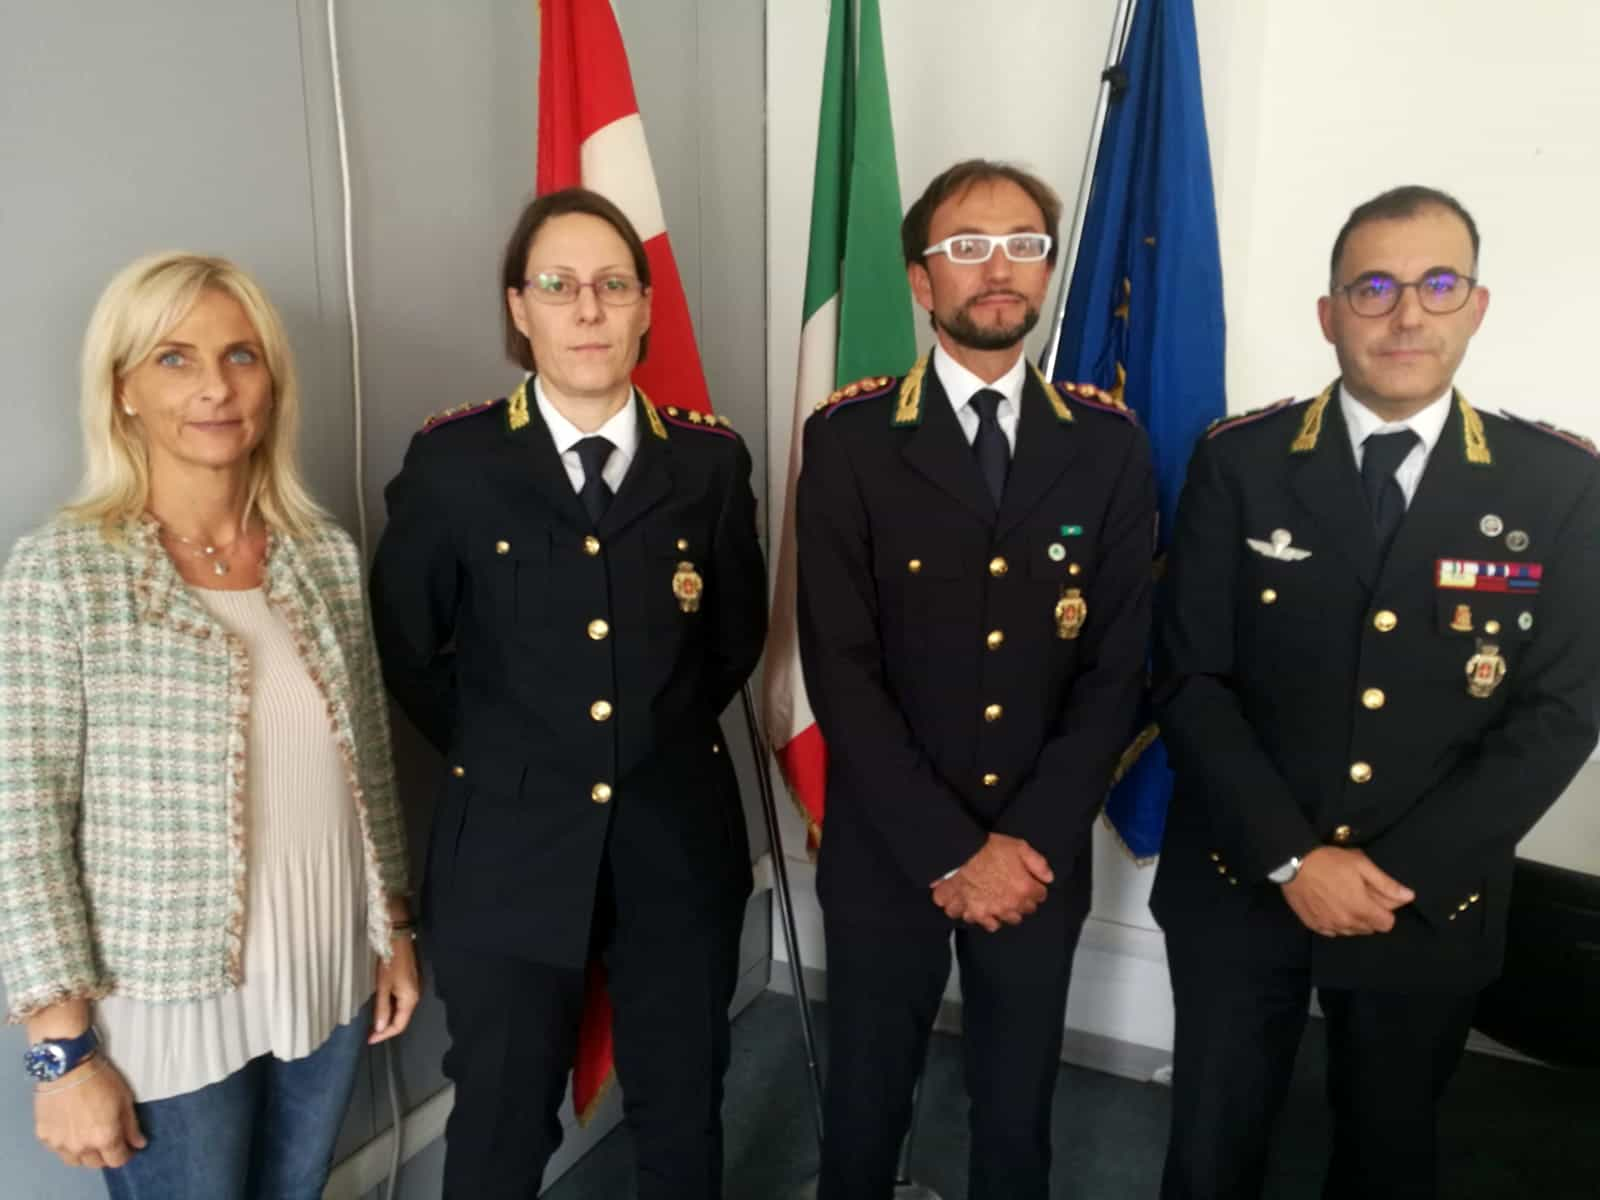 Elena Negretti, Marialuce Benedetti, Donatello Ghezzo, Aurelio Giannini